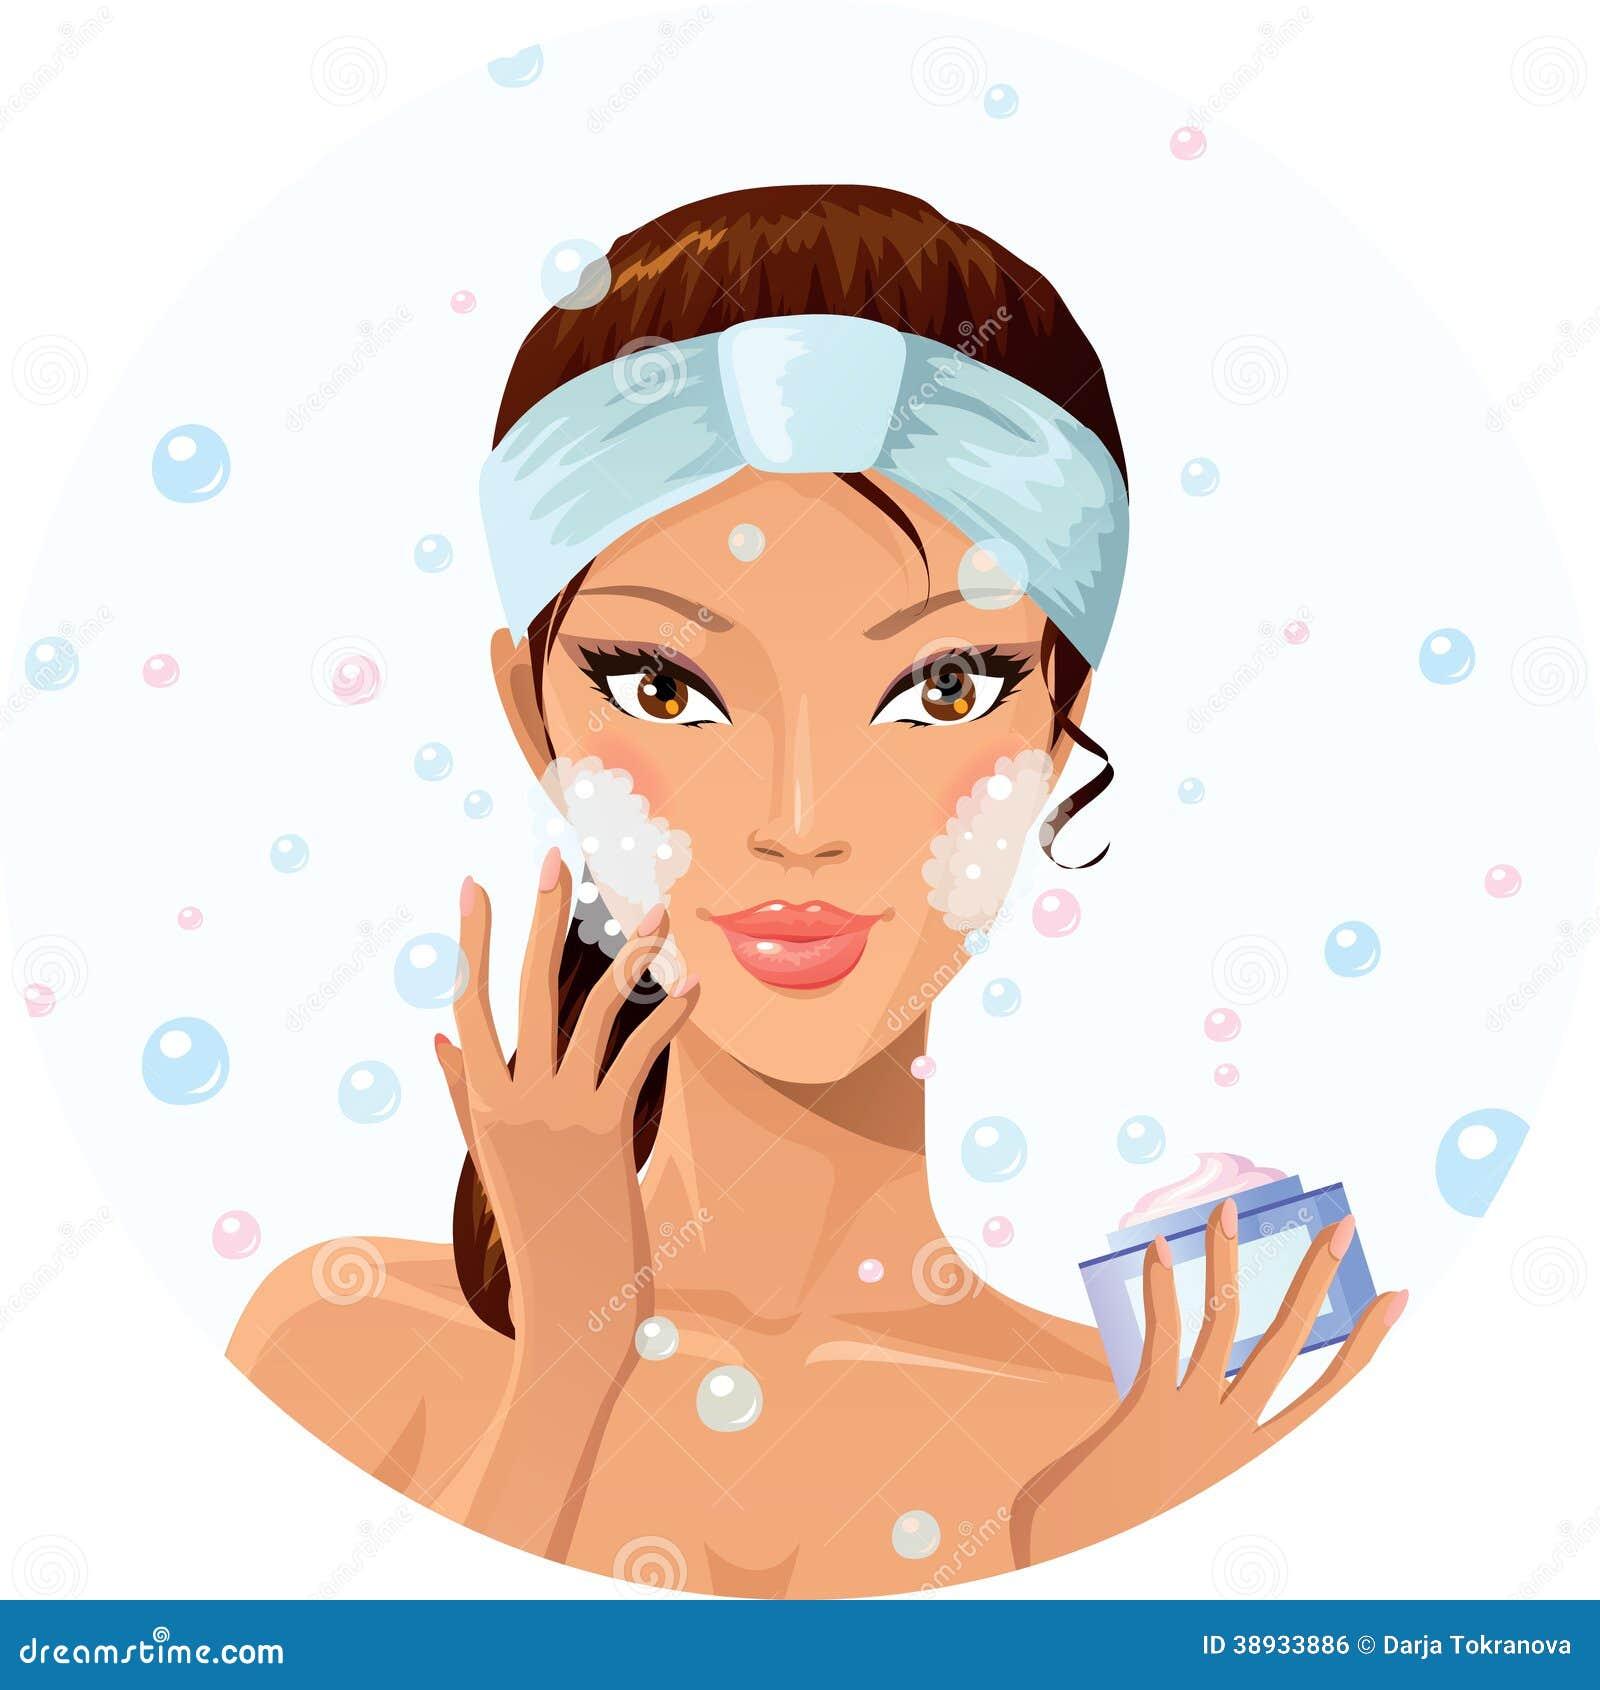 Fashion Clipart Light Skin Bubble Bath Clipart Cute Girl: Girl Washing Face With Soap Vector Illustration